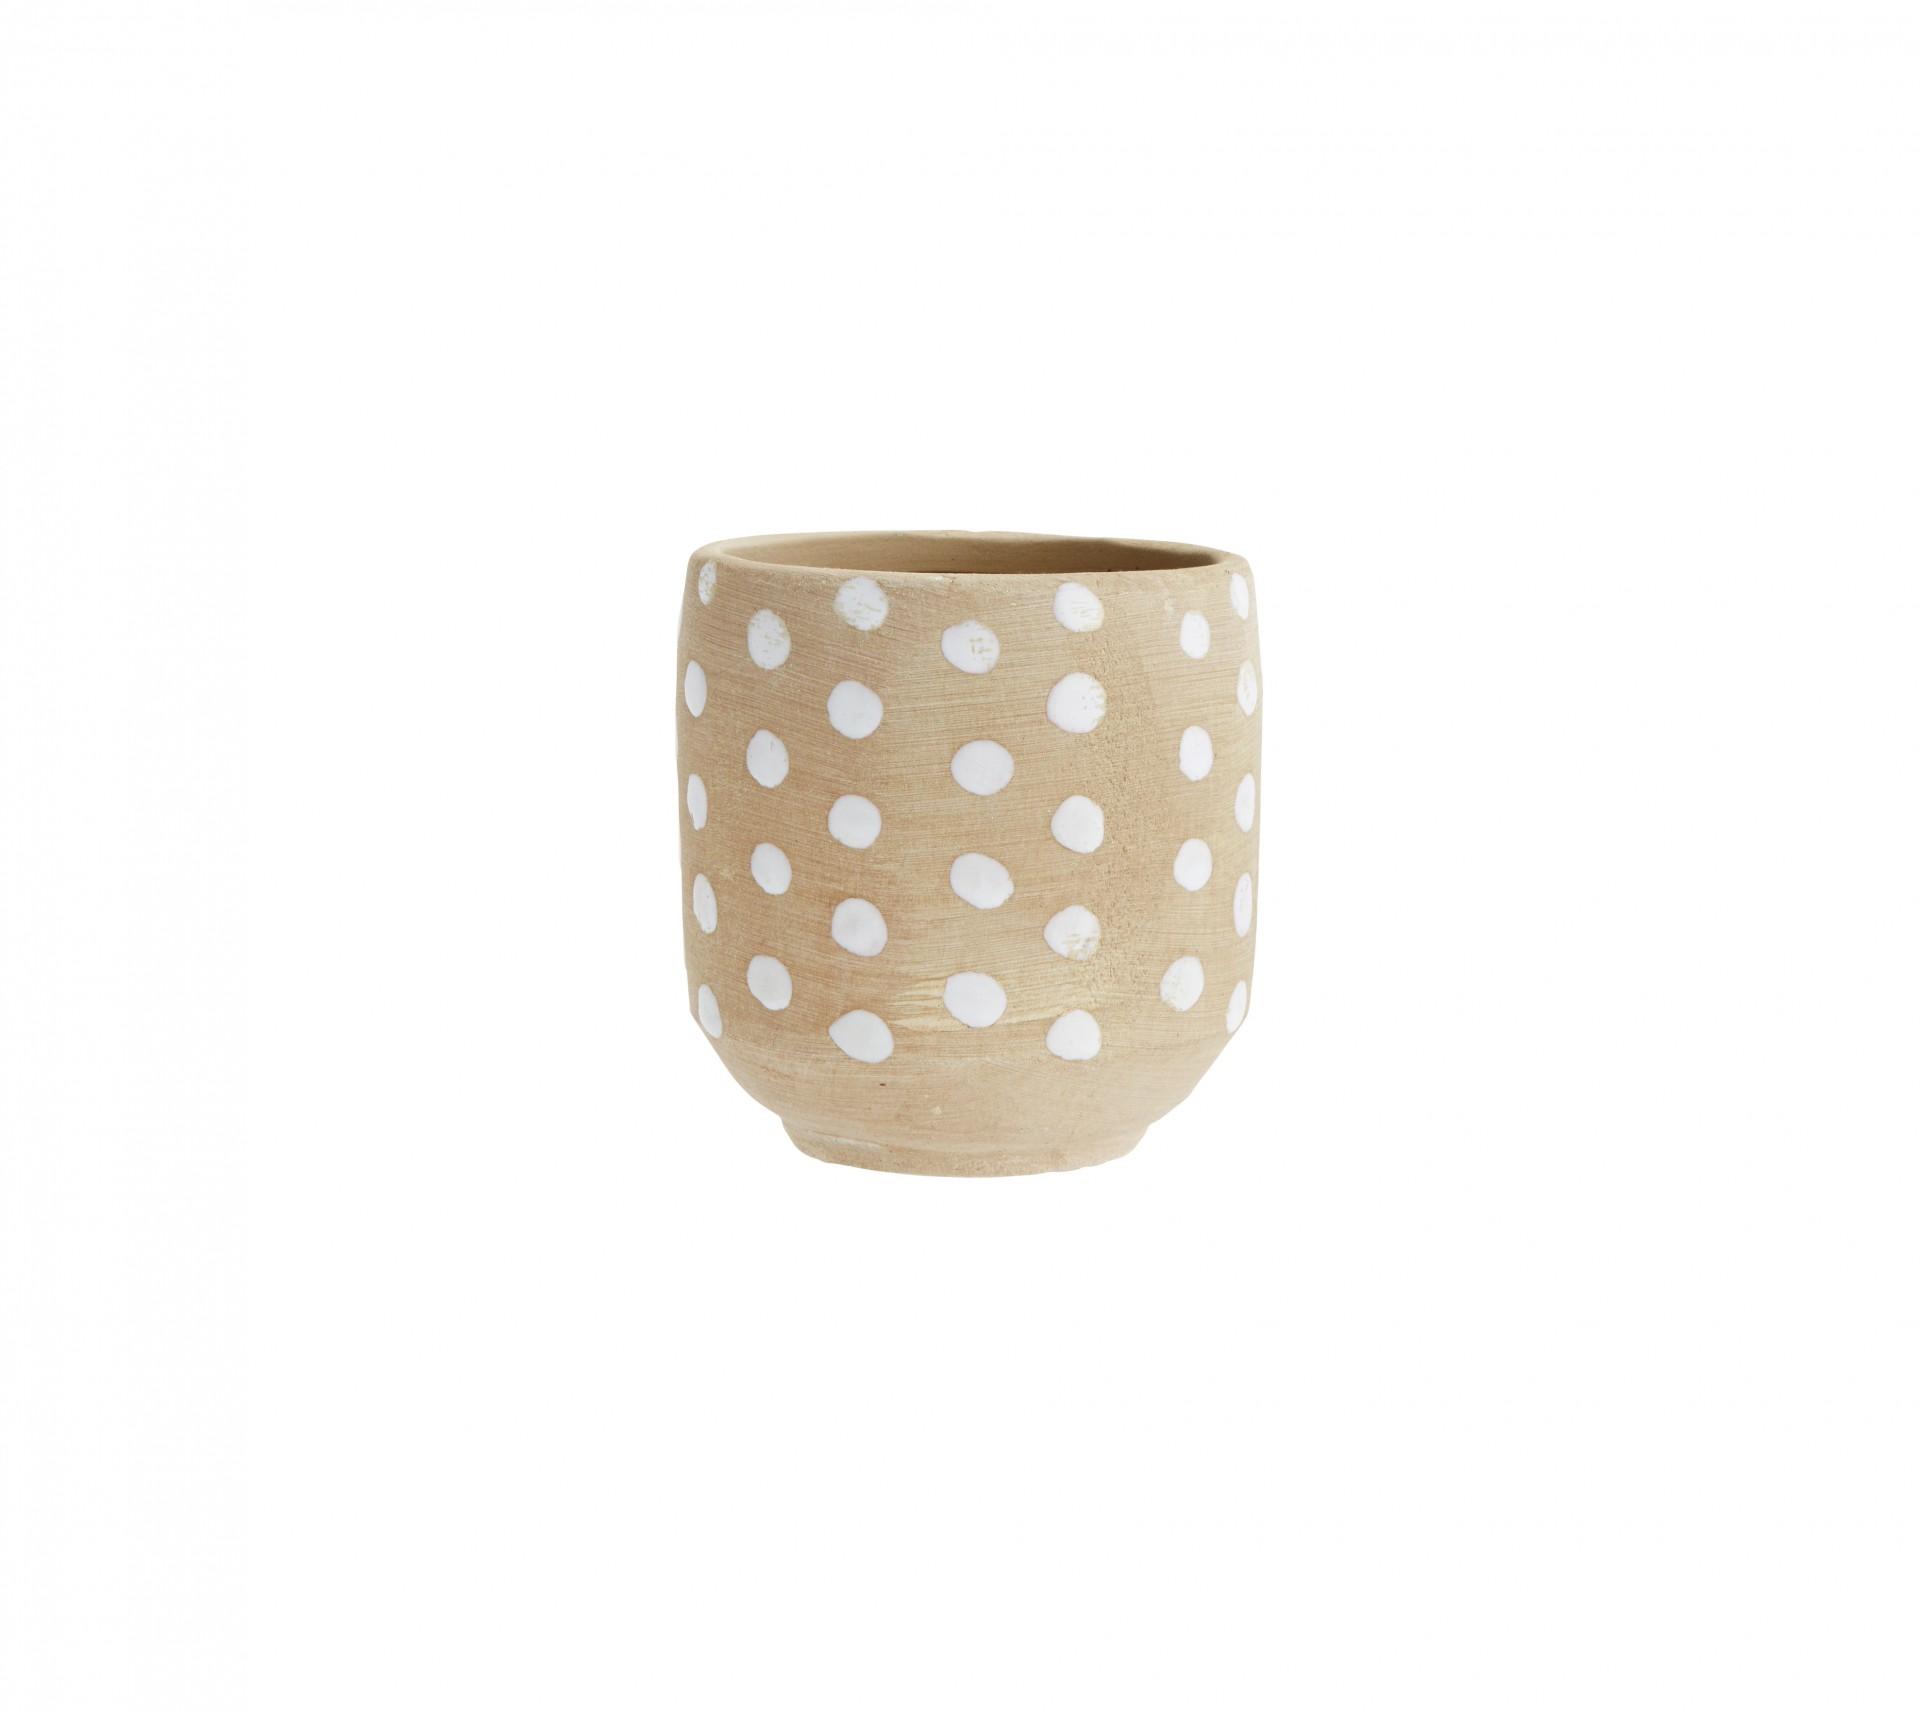 Vaso Dot, cerâmica, Ø13x13 cm